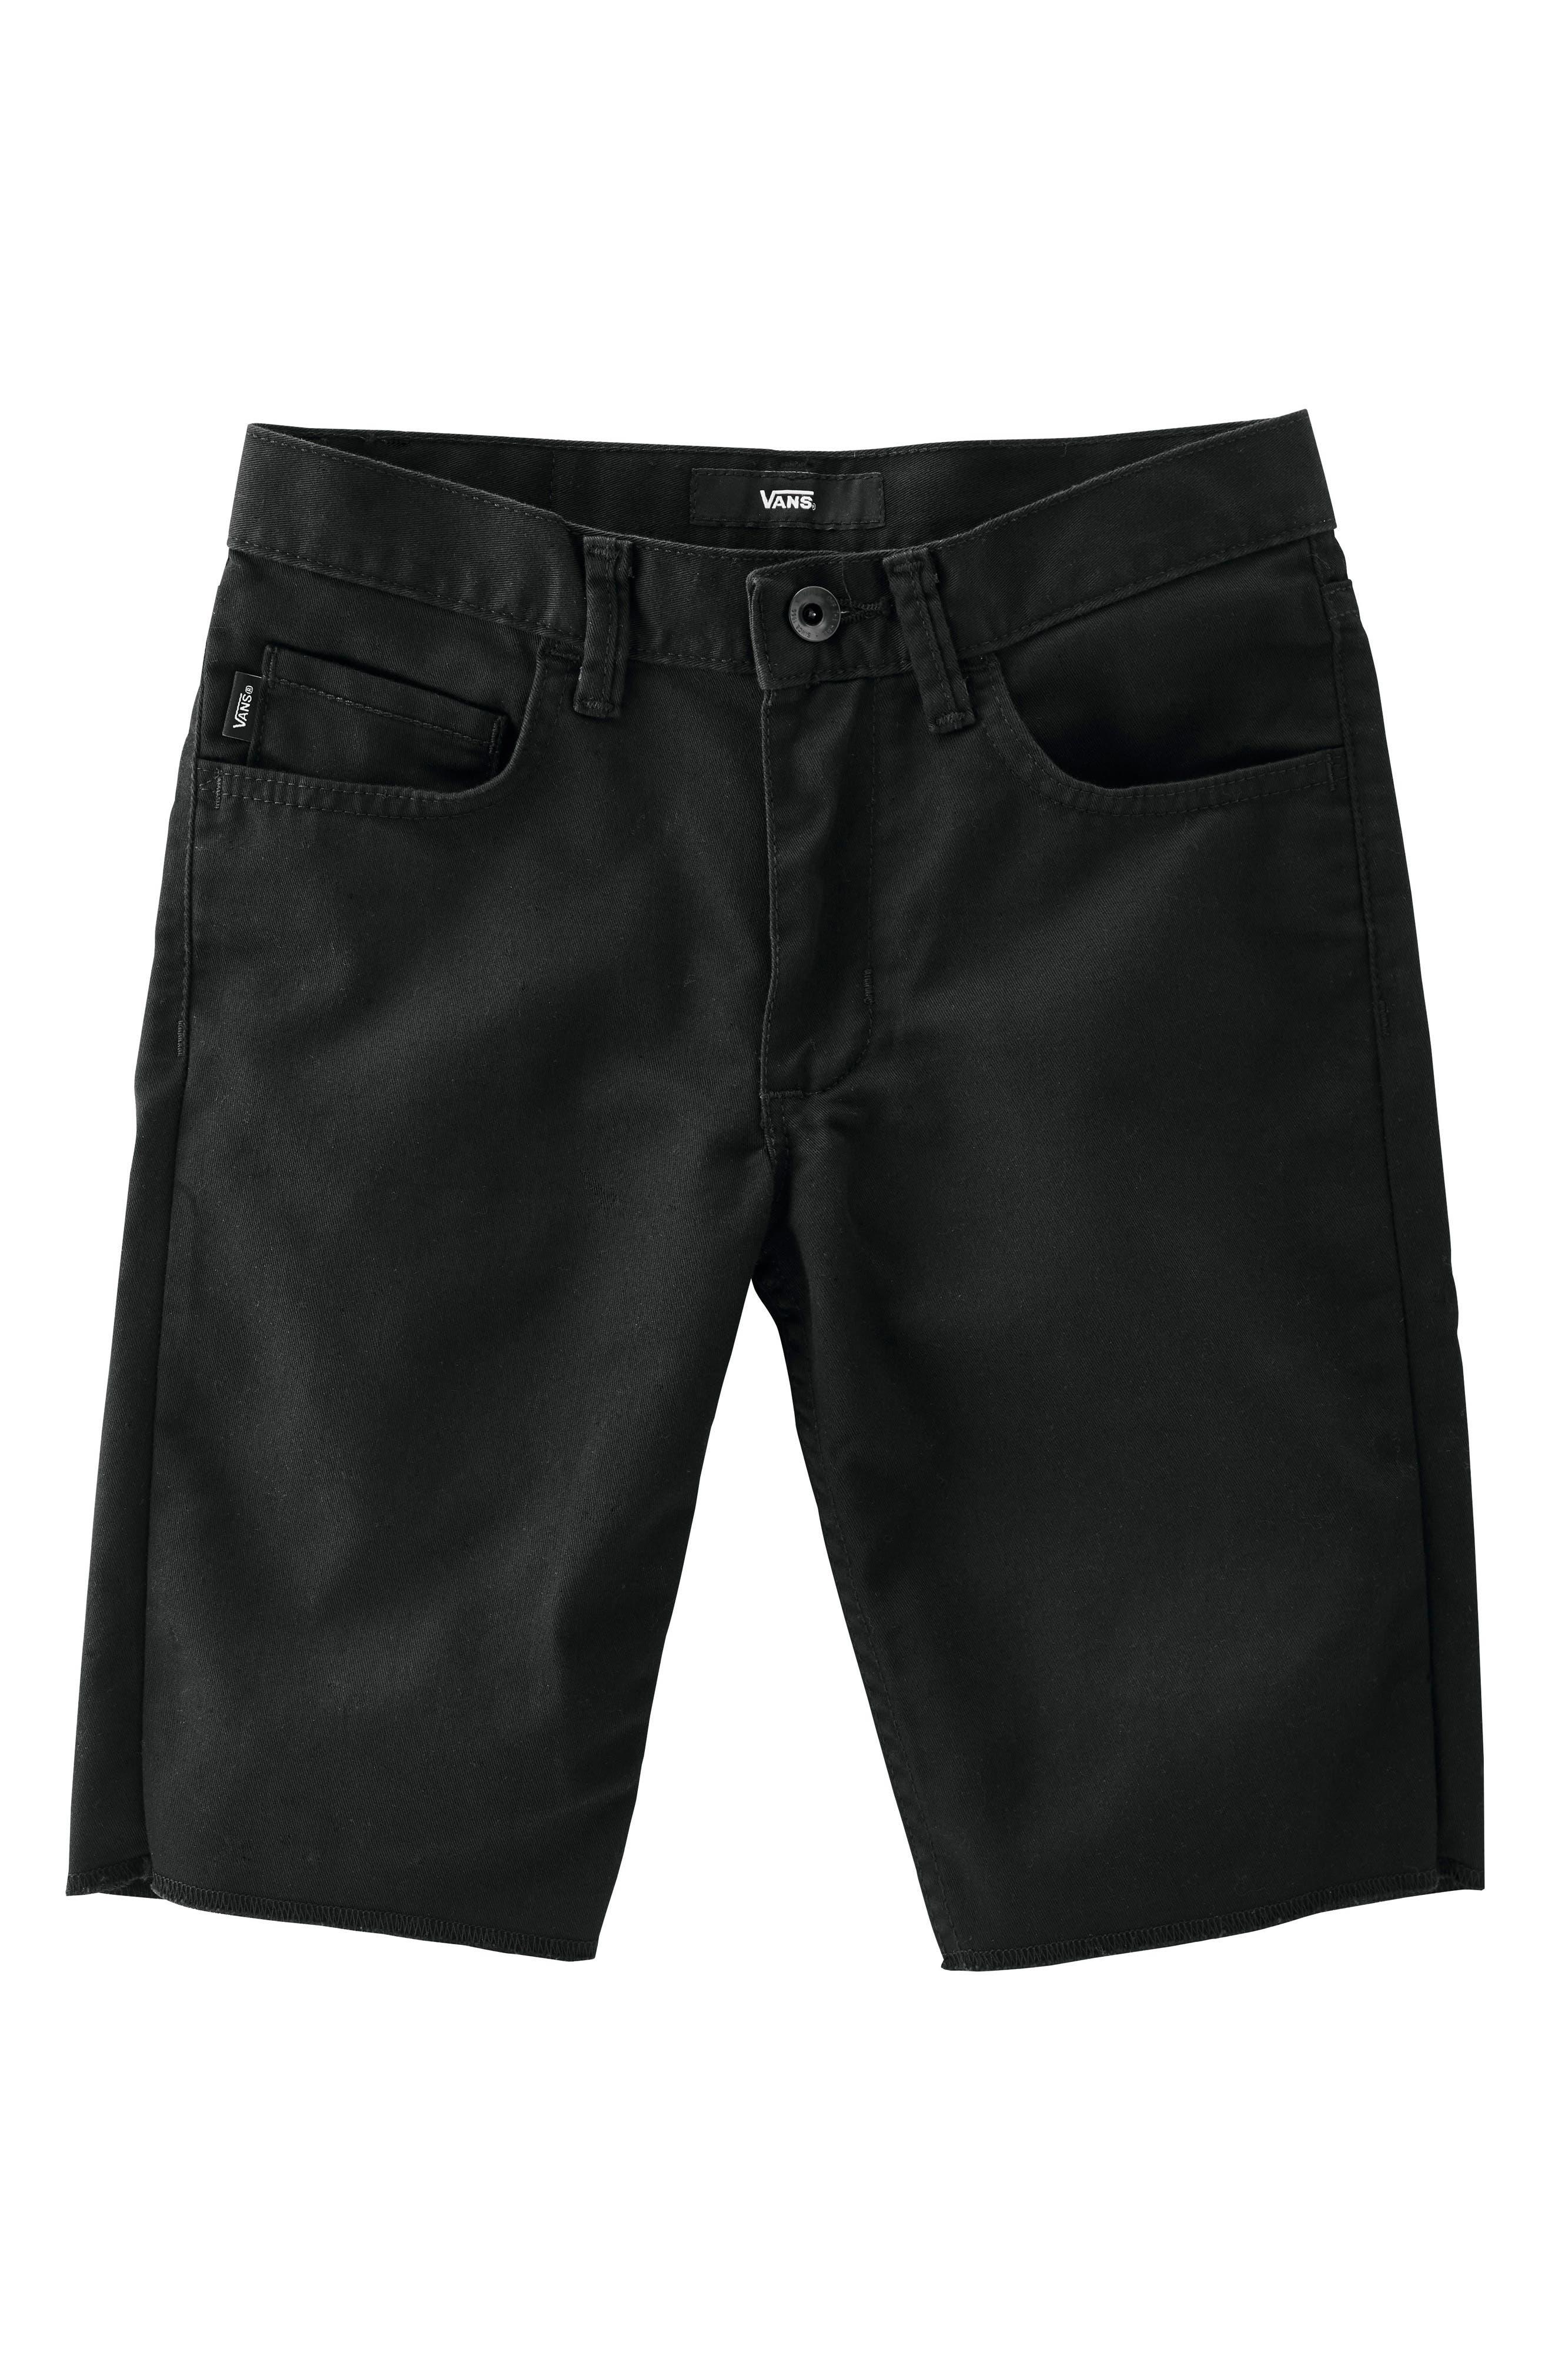 Covina II - Anthony Van Engelen Twill Shorts,                             Main thumbnail 1, color,                             Black